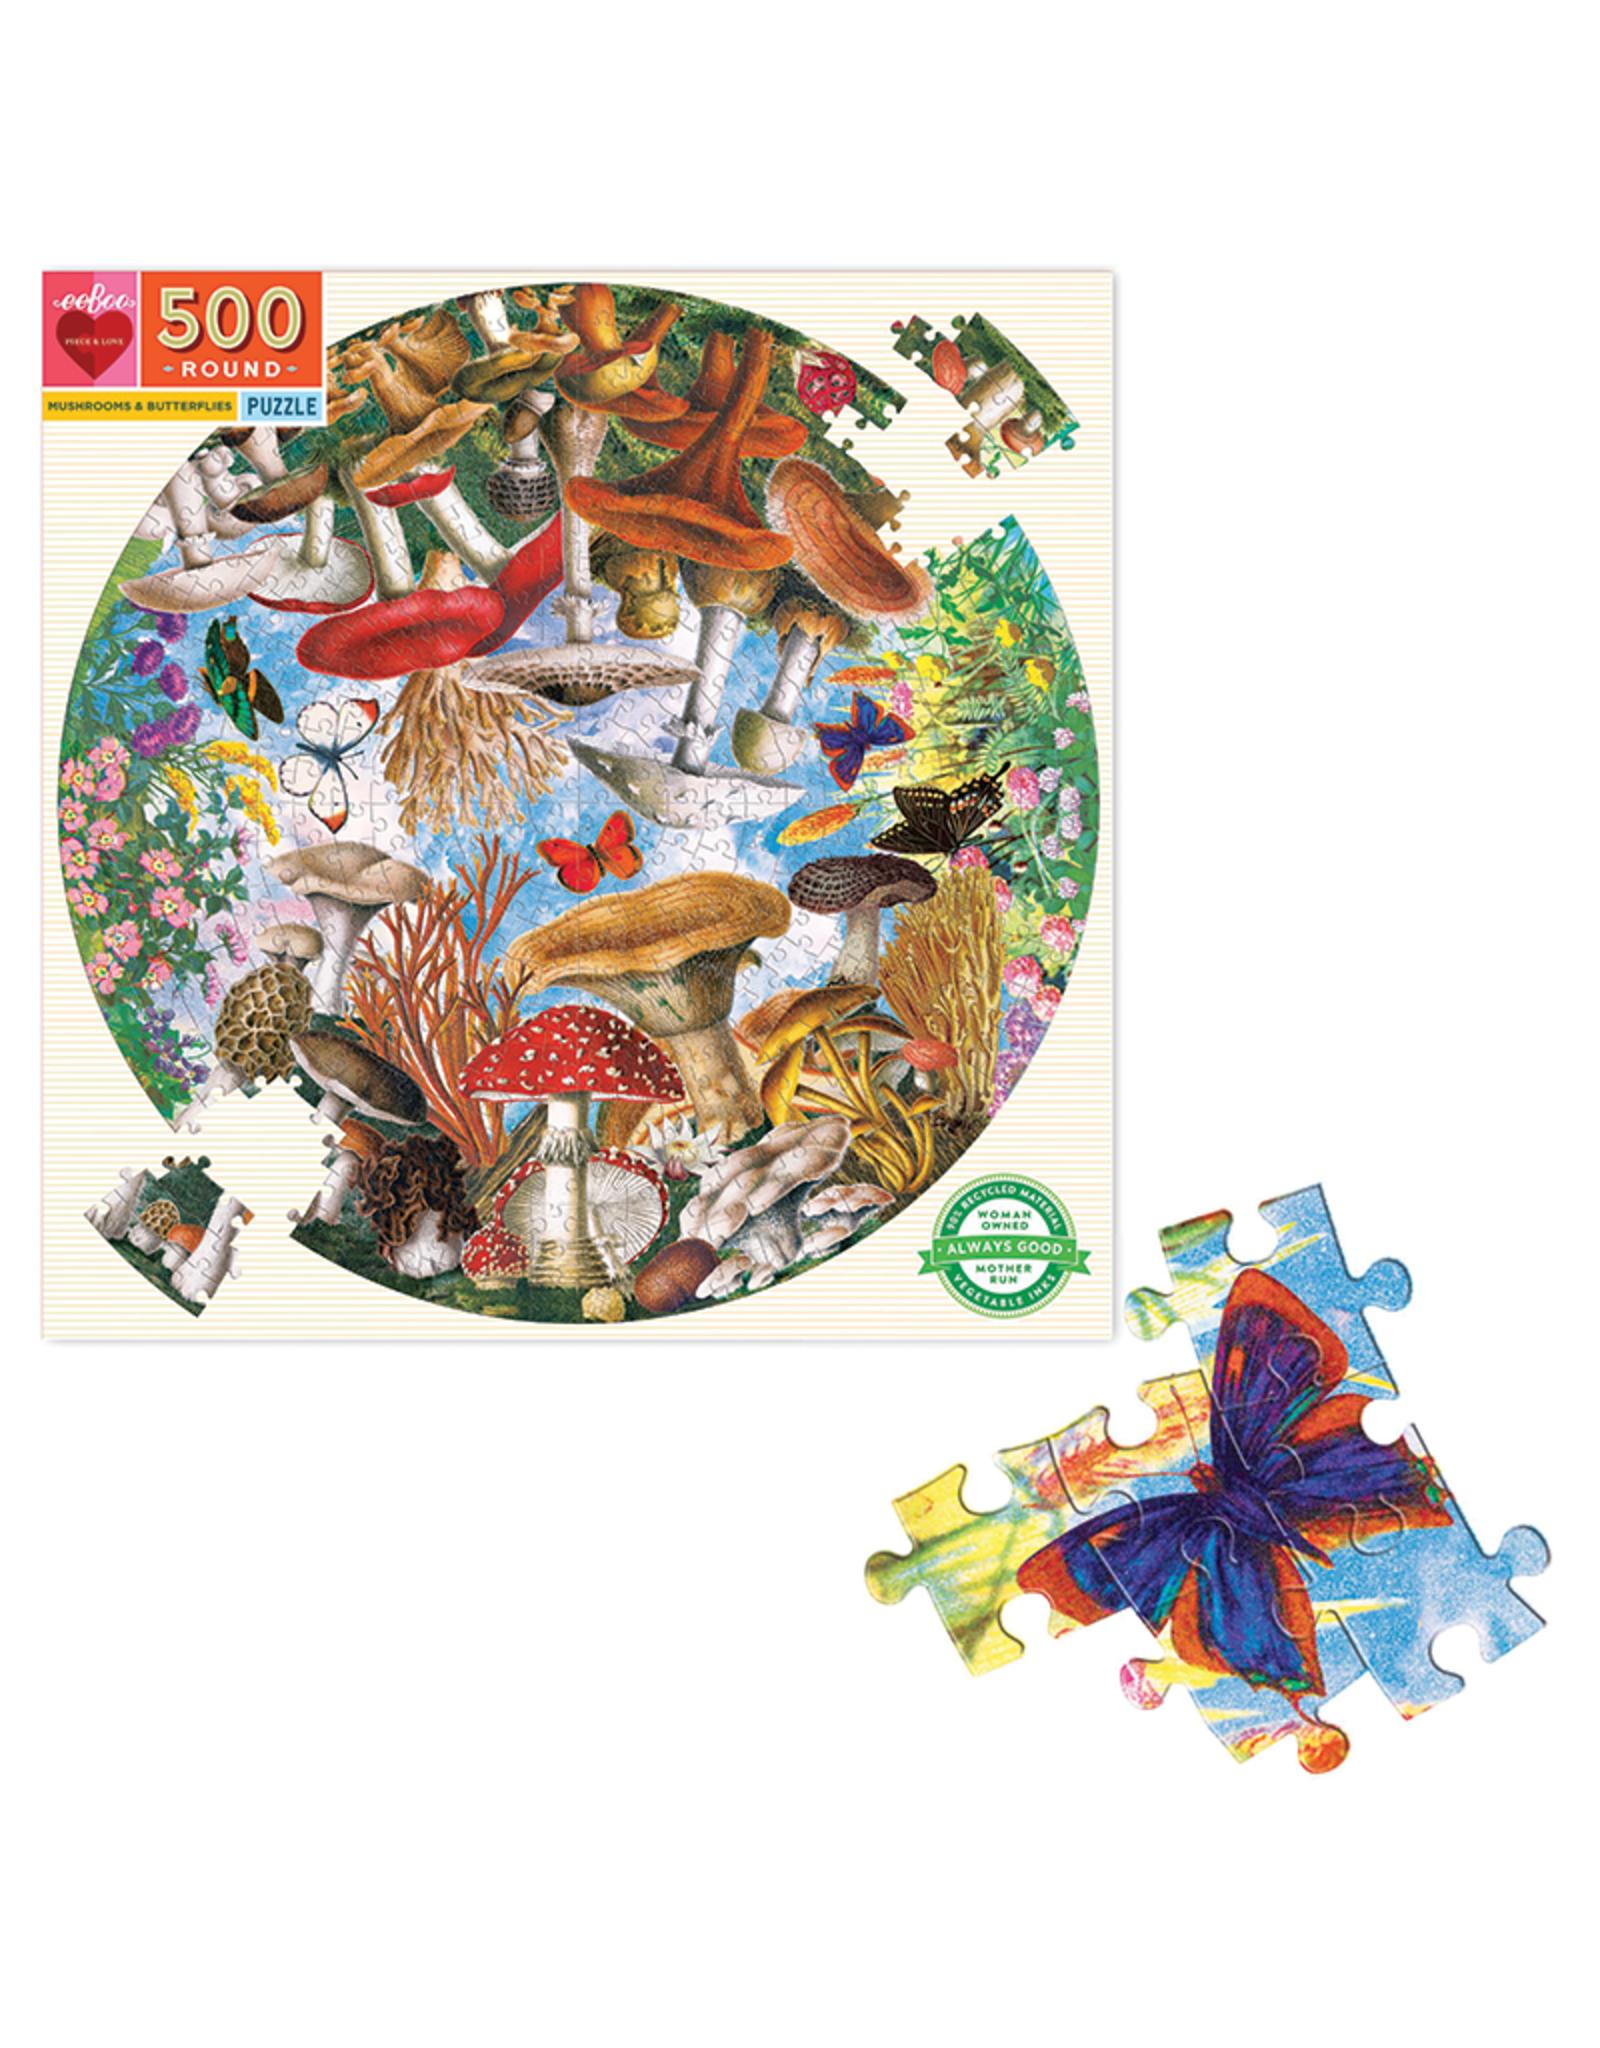 eeBoo Mushrooms and Butterflies 500-Piece Puzzle